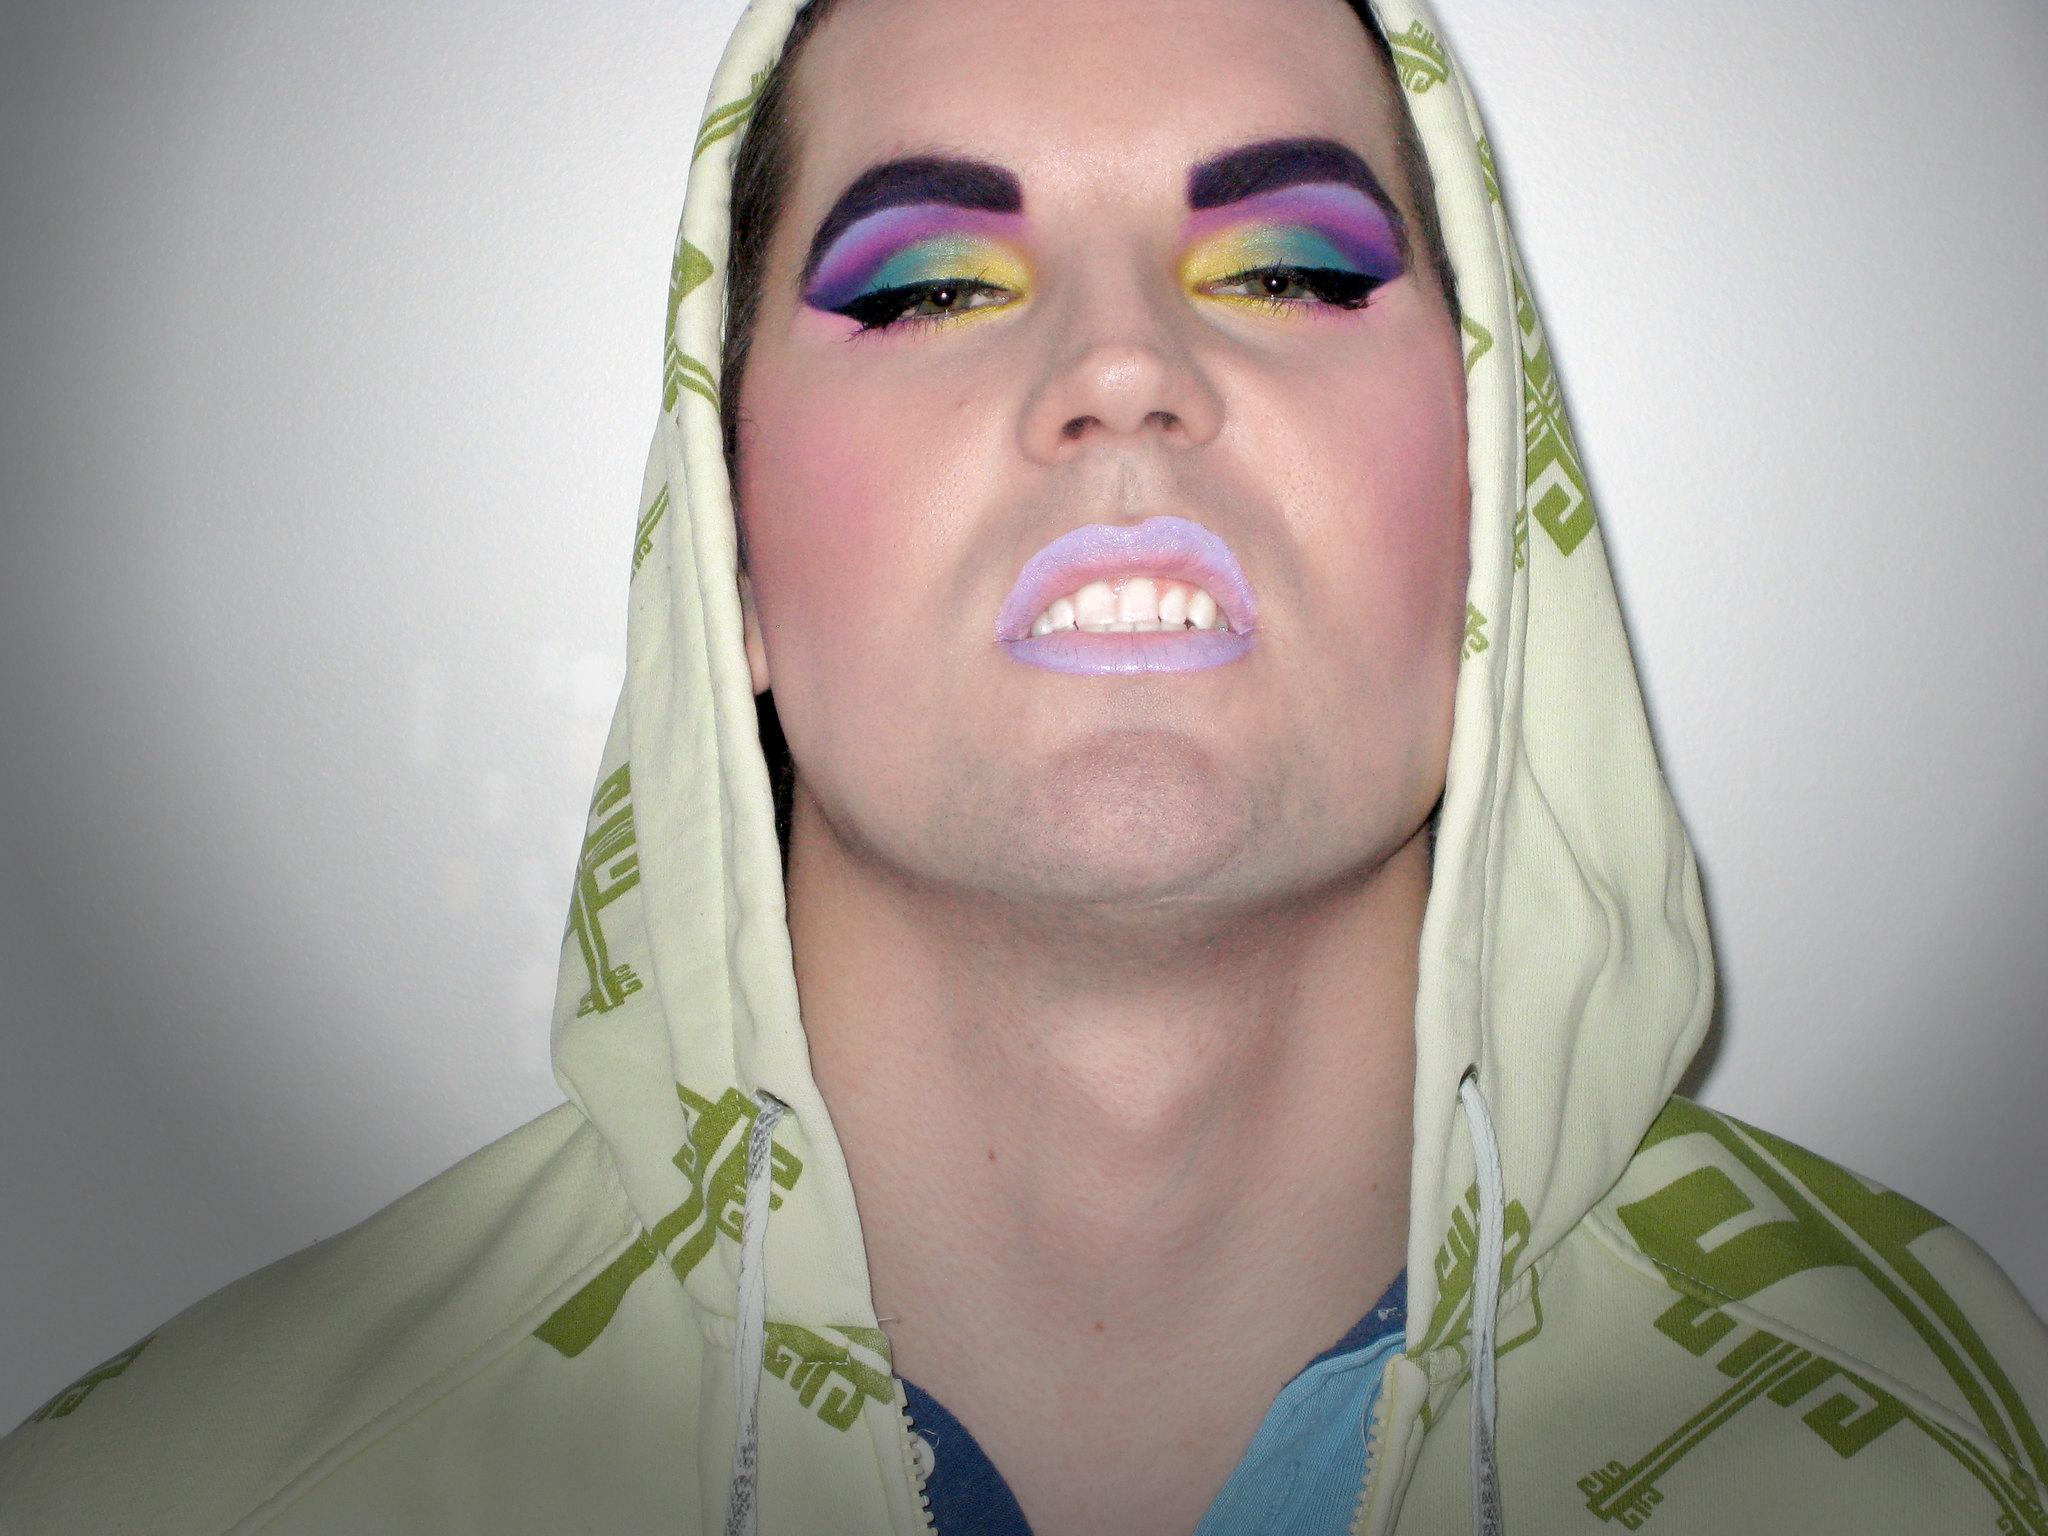 Reddit Top 2 5 Million Makeup Csv At Master Umbrae Reddit Top 2 5